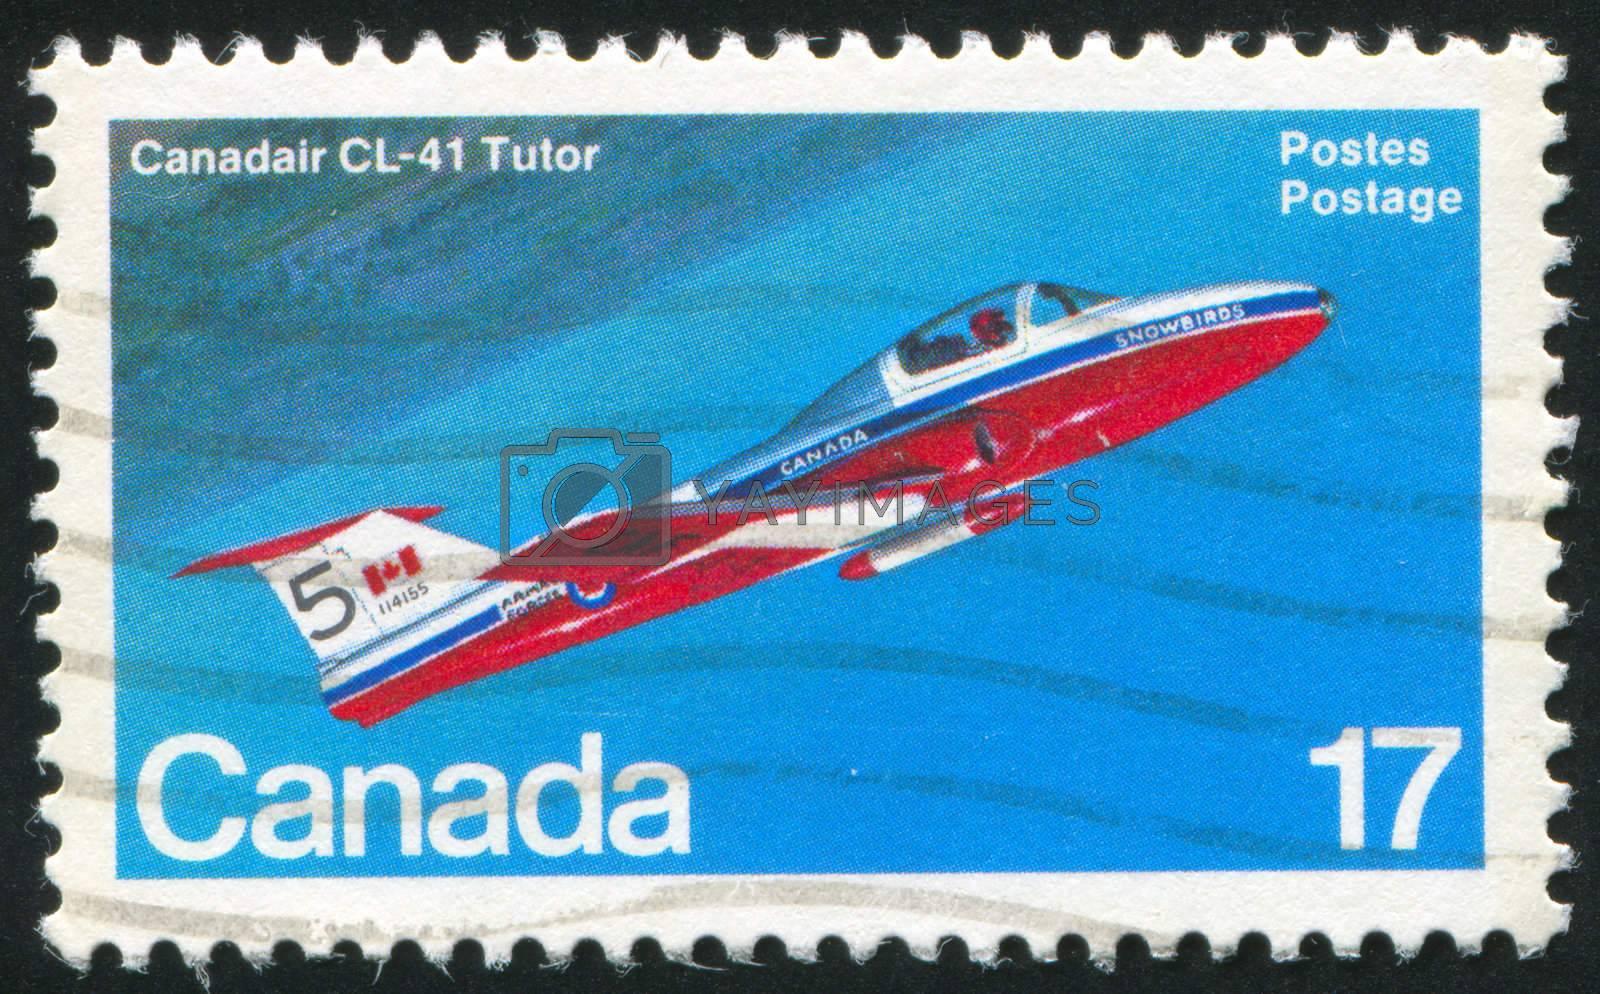 CANADA - CIRCA 1981: stamp printed by Canada, shows aeroplane, Canadair CL-41 Tutor, circa 1981